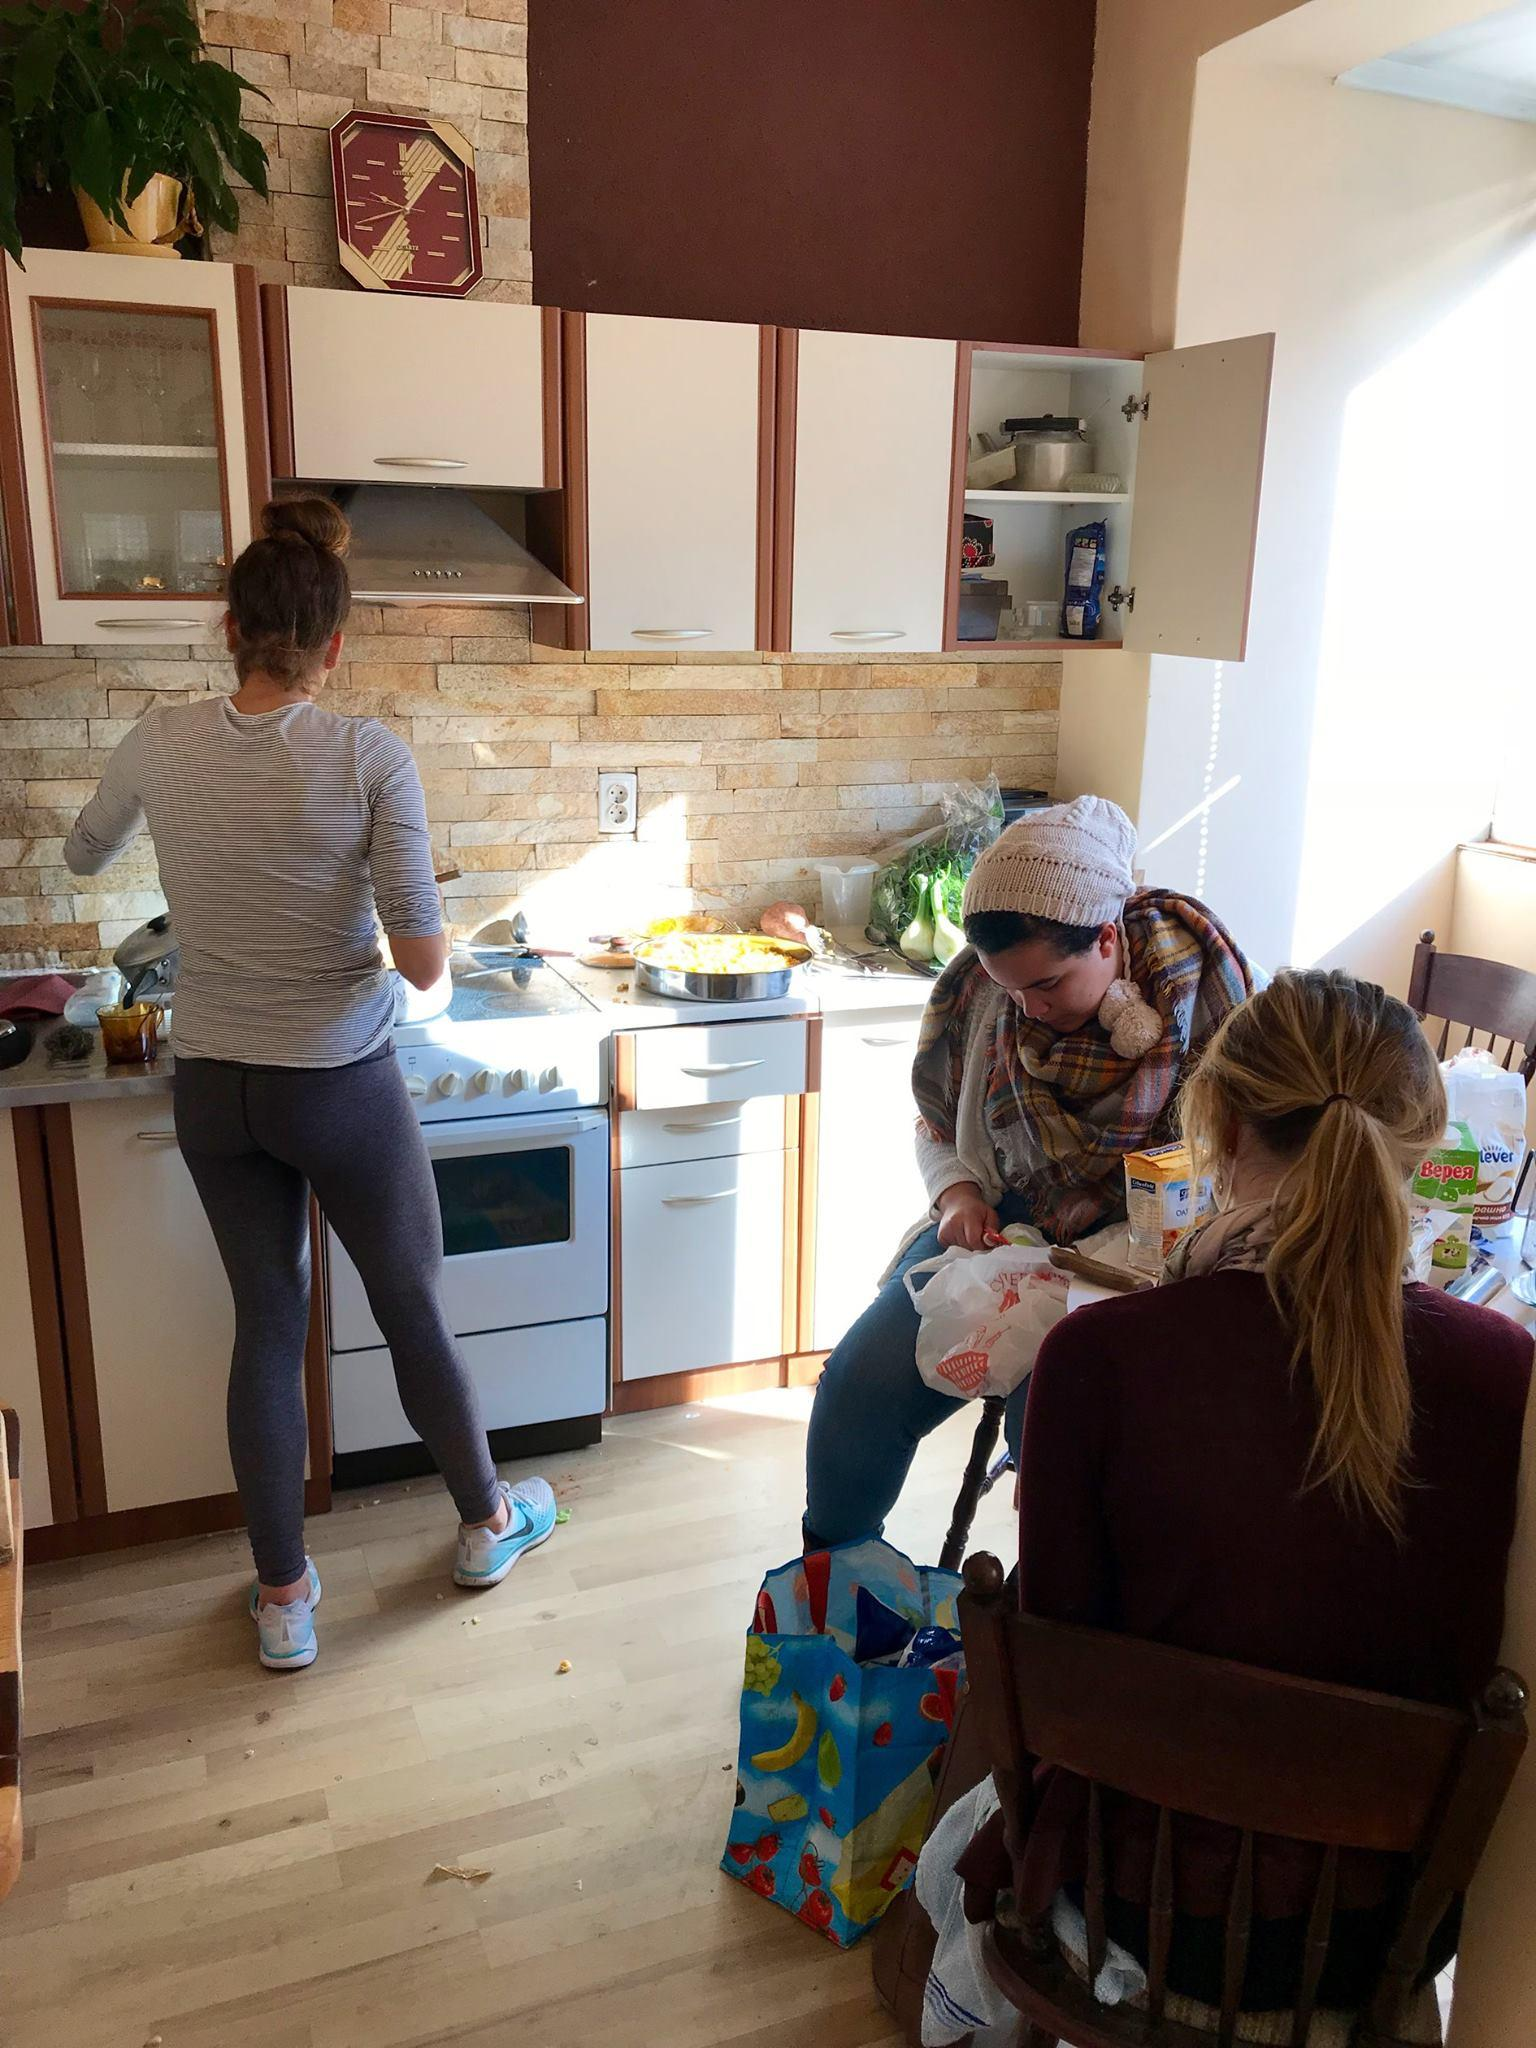 Girls Making Thanksgiving Food At Office